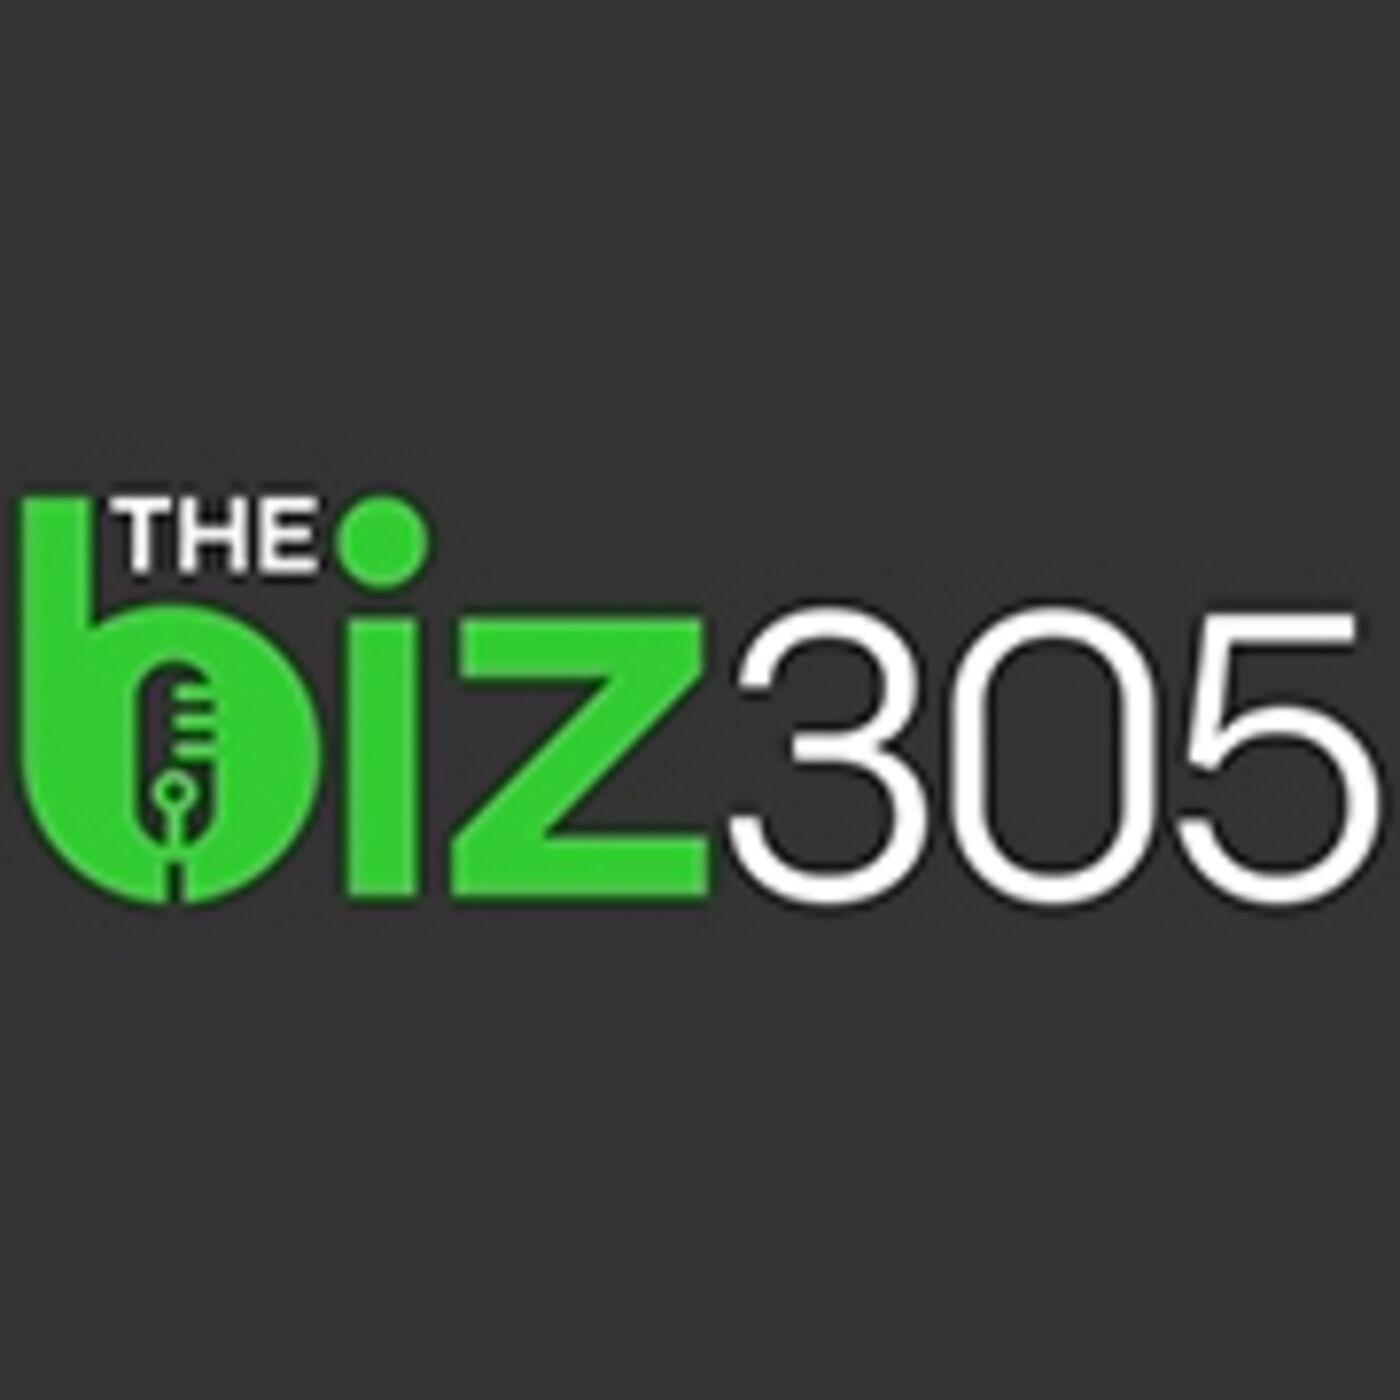 BIZ 305 features Dr. Jose Rodríguez-Feliz   Whilly Bermudez